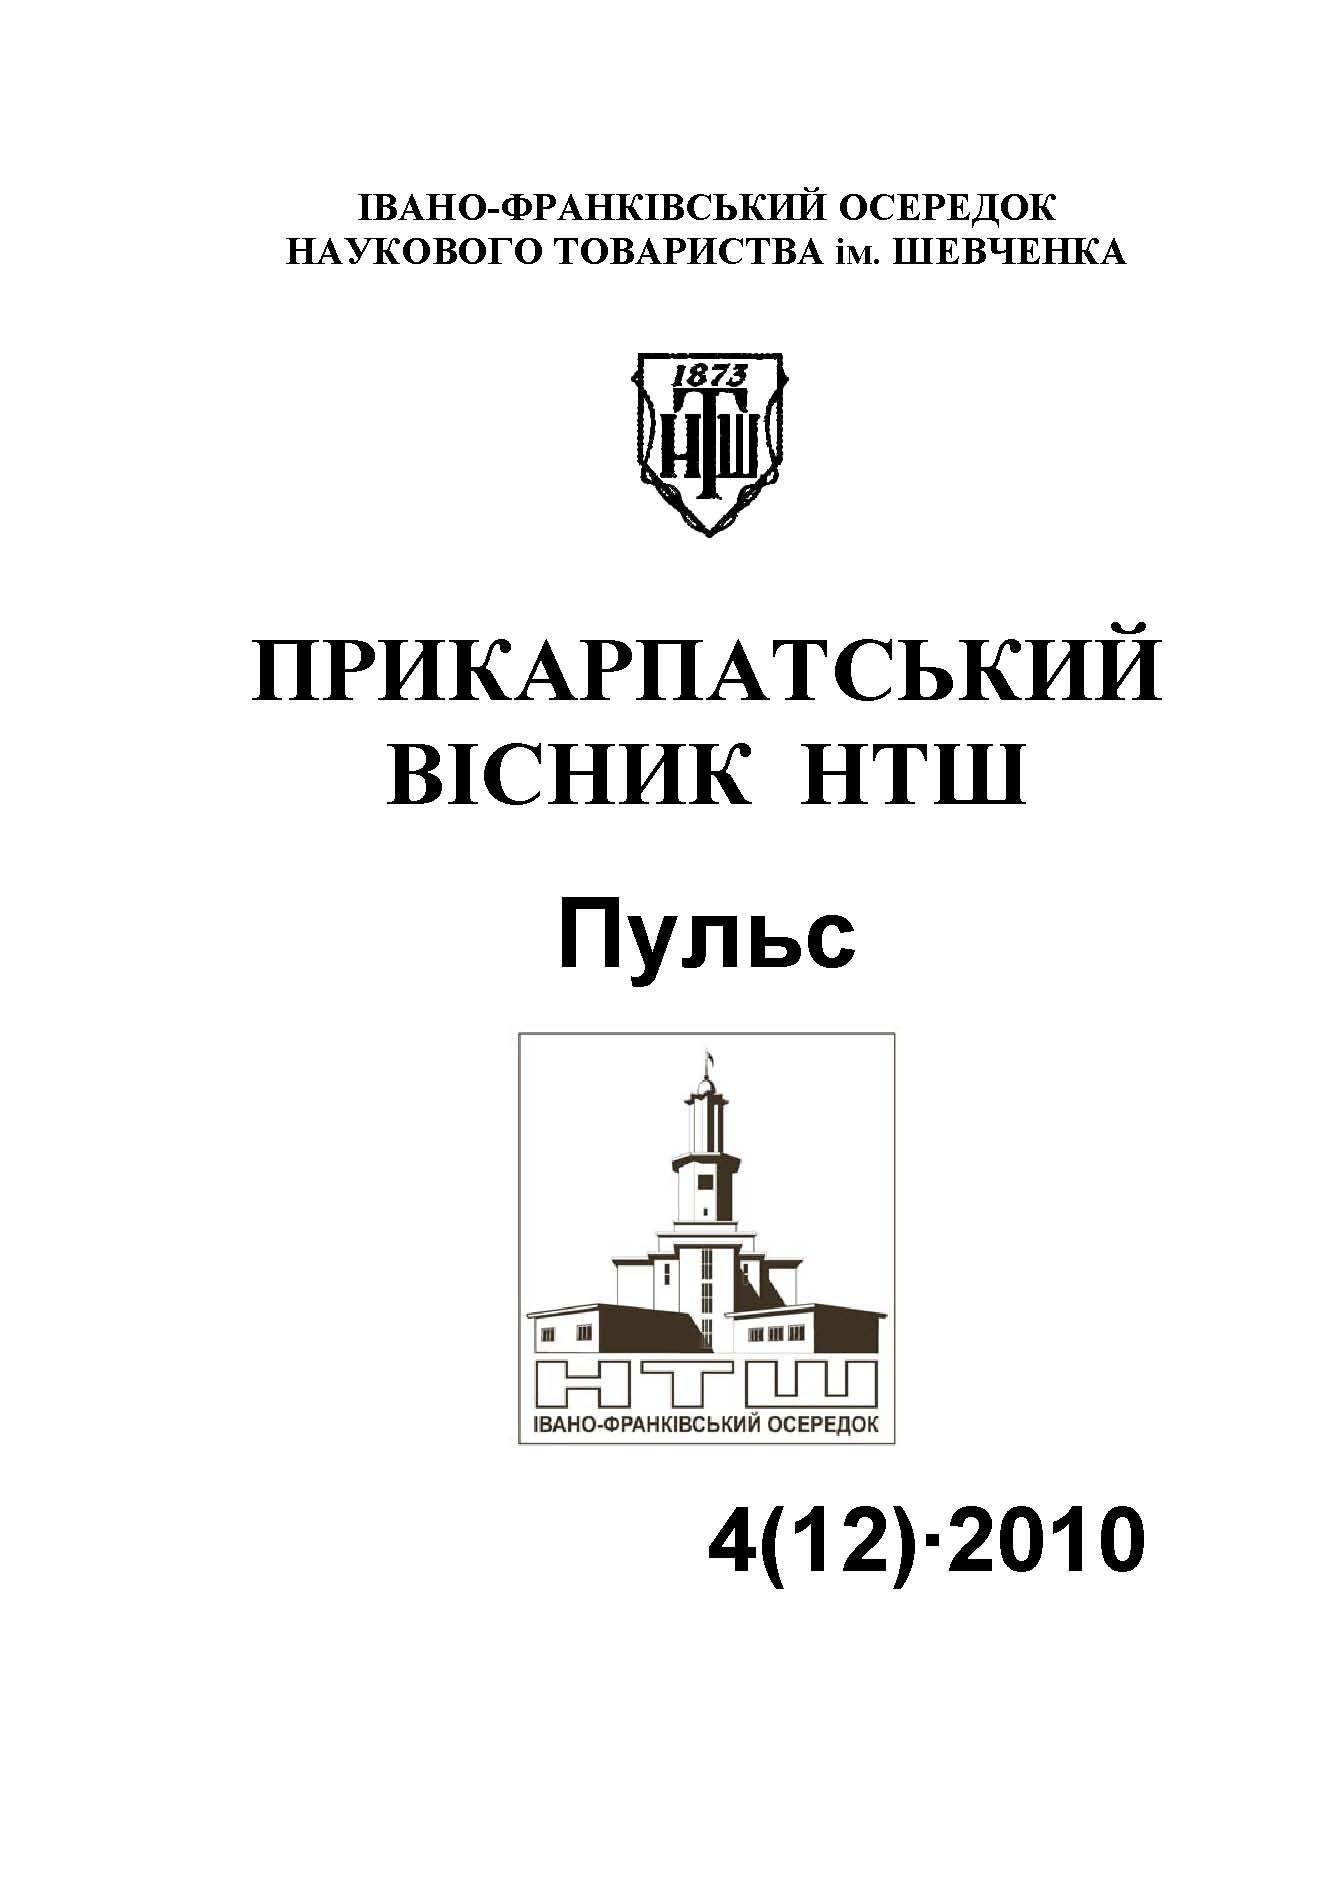 View No. 4(12) (2010): PRECARPATHIAN BULLETIN OF THE SHEVCHENKO SCIENTIFIC SOCIETY Pulse